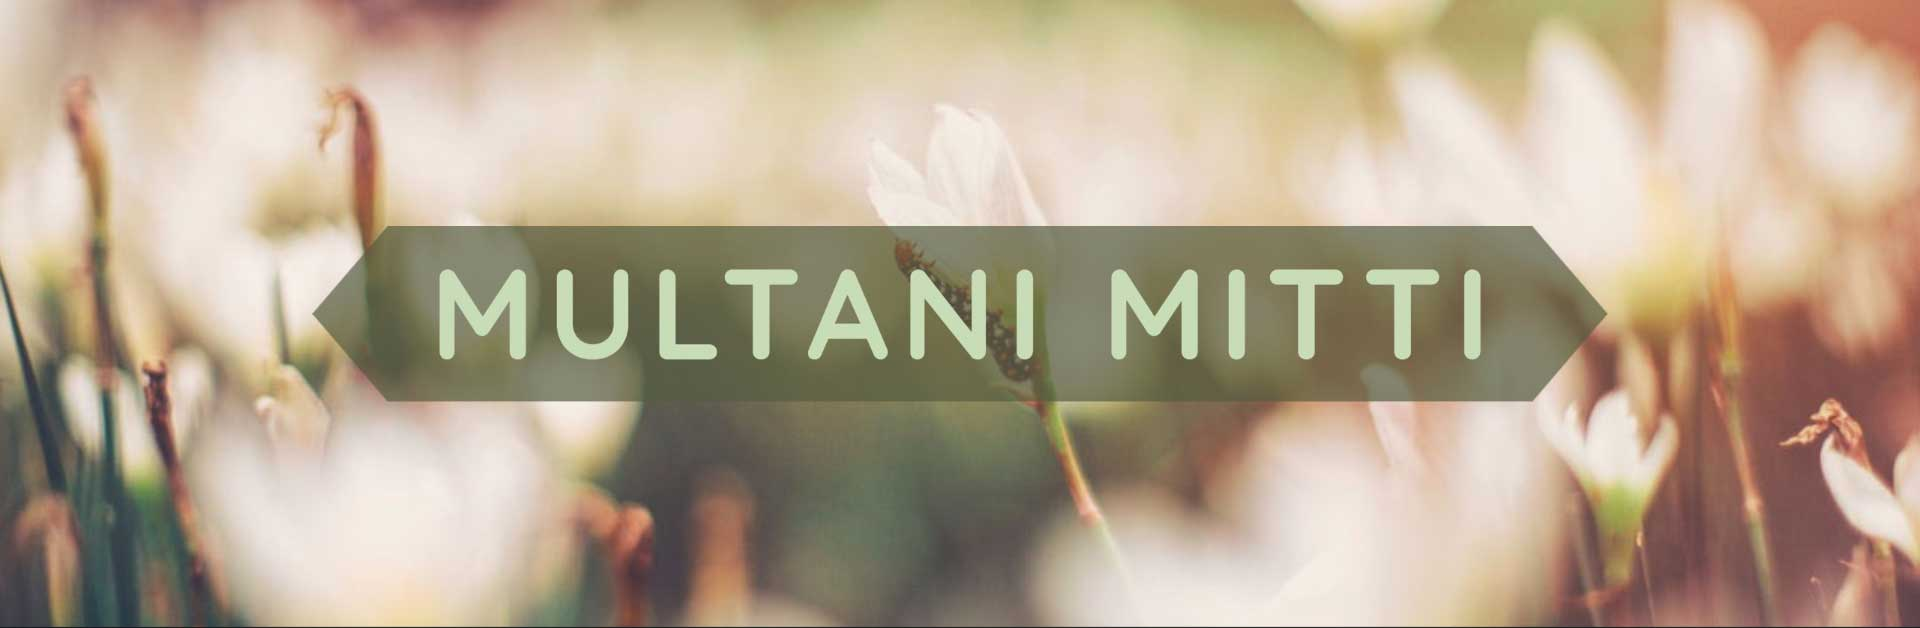 Copertina Multani mitti